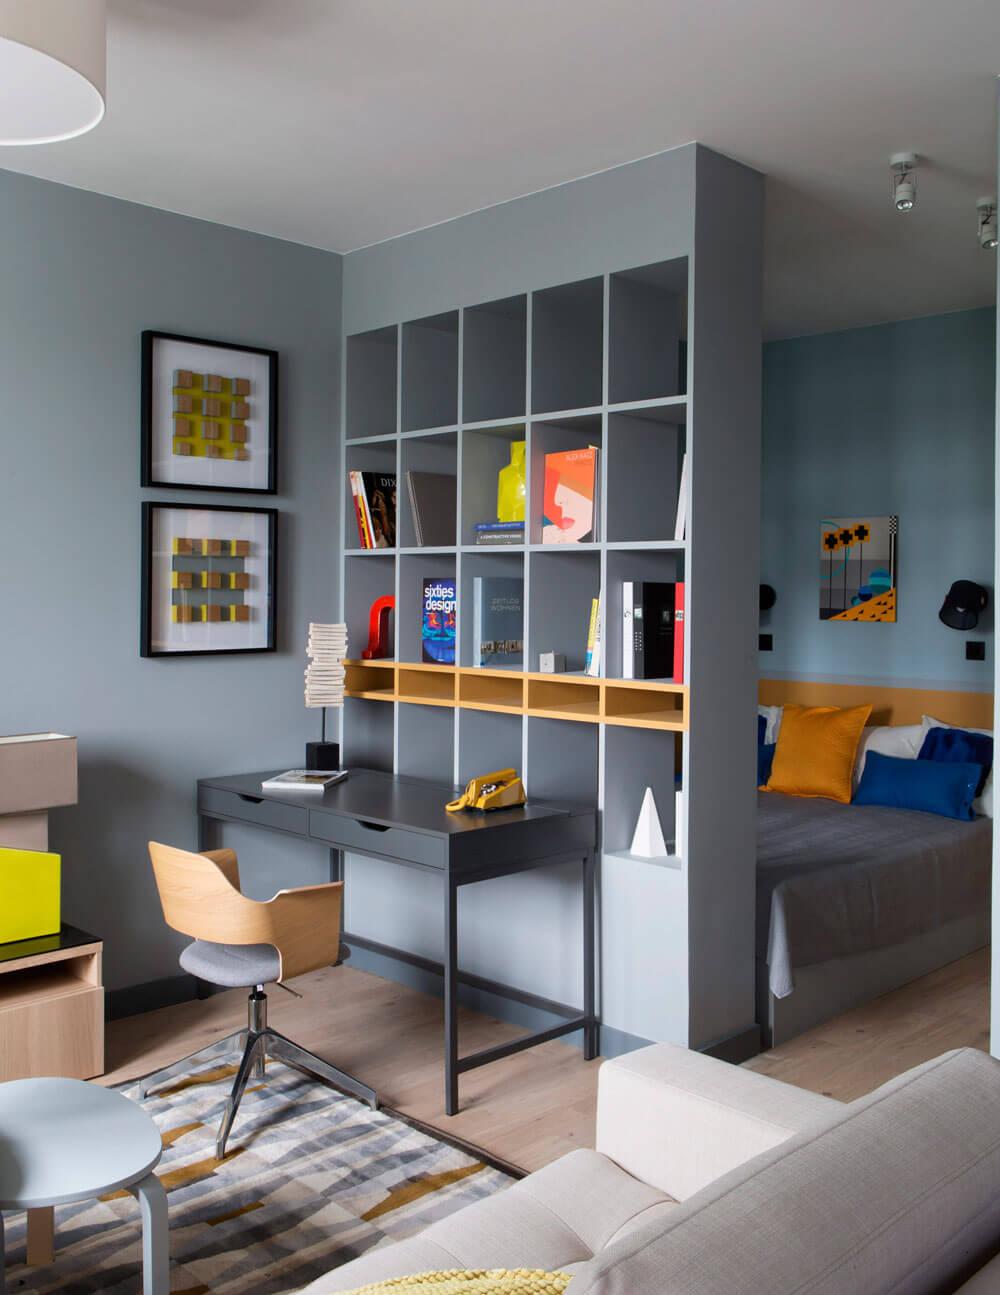 дизайн квартиры студии 25 кв м